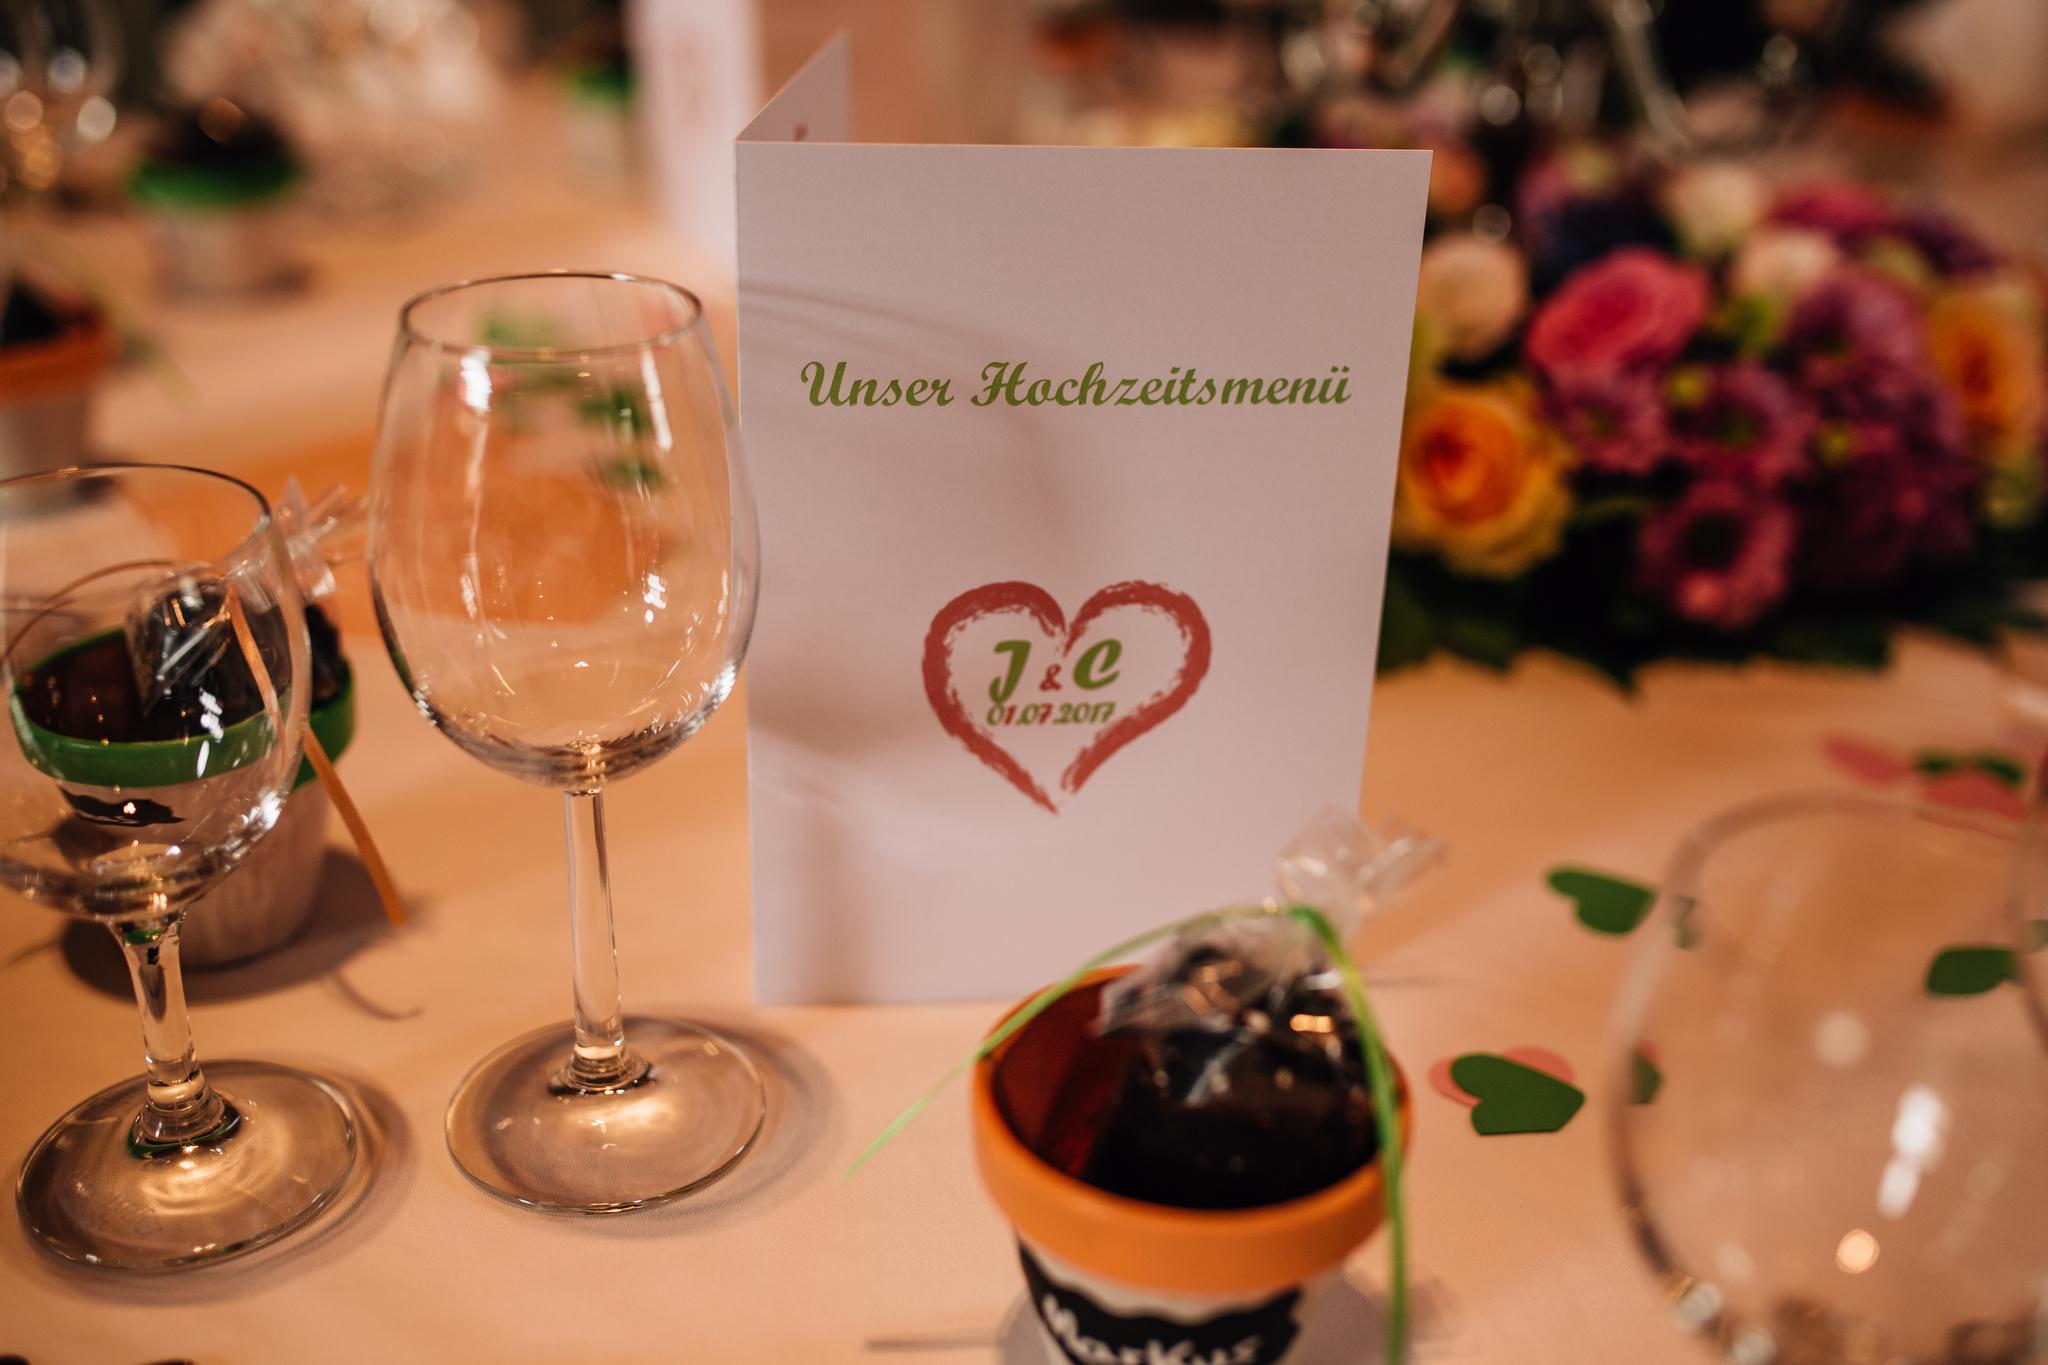 Claudia Krawinkel Fotografie Hochzeitsfotograf Essen Düsseldorf Dormagen Kloster Knechtsteden Hochzeitsreportage Hochzeit Knechtsteden27